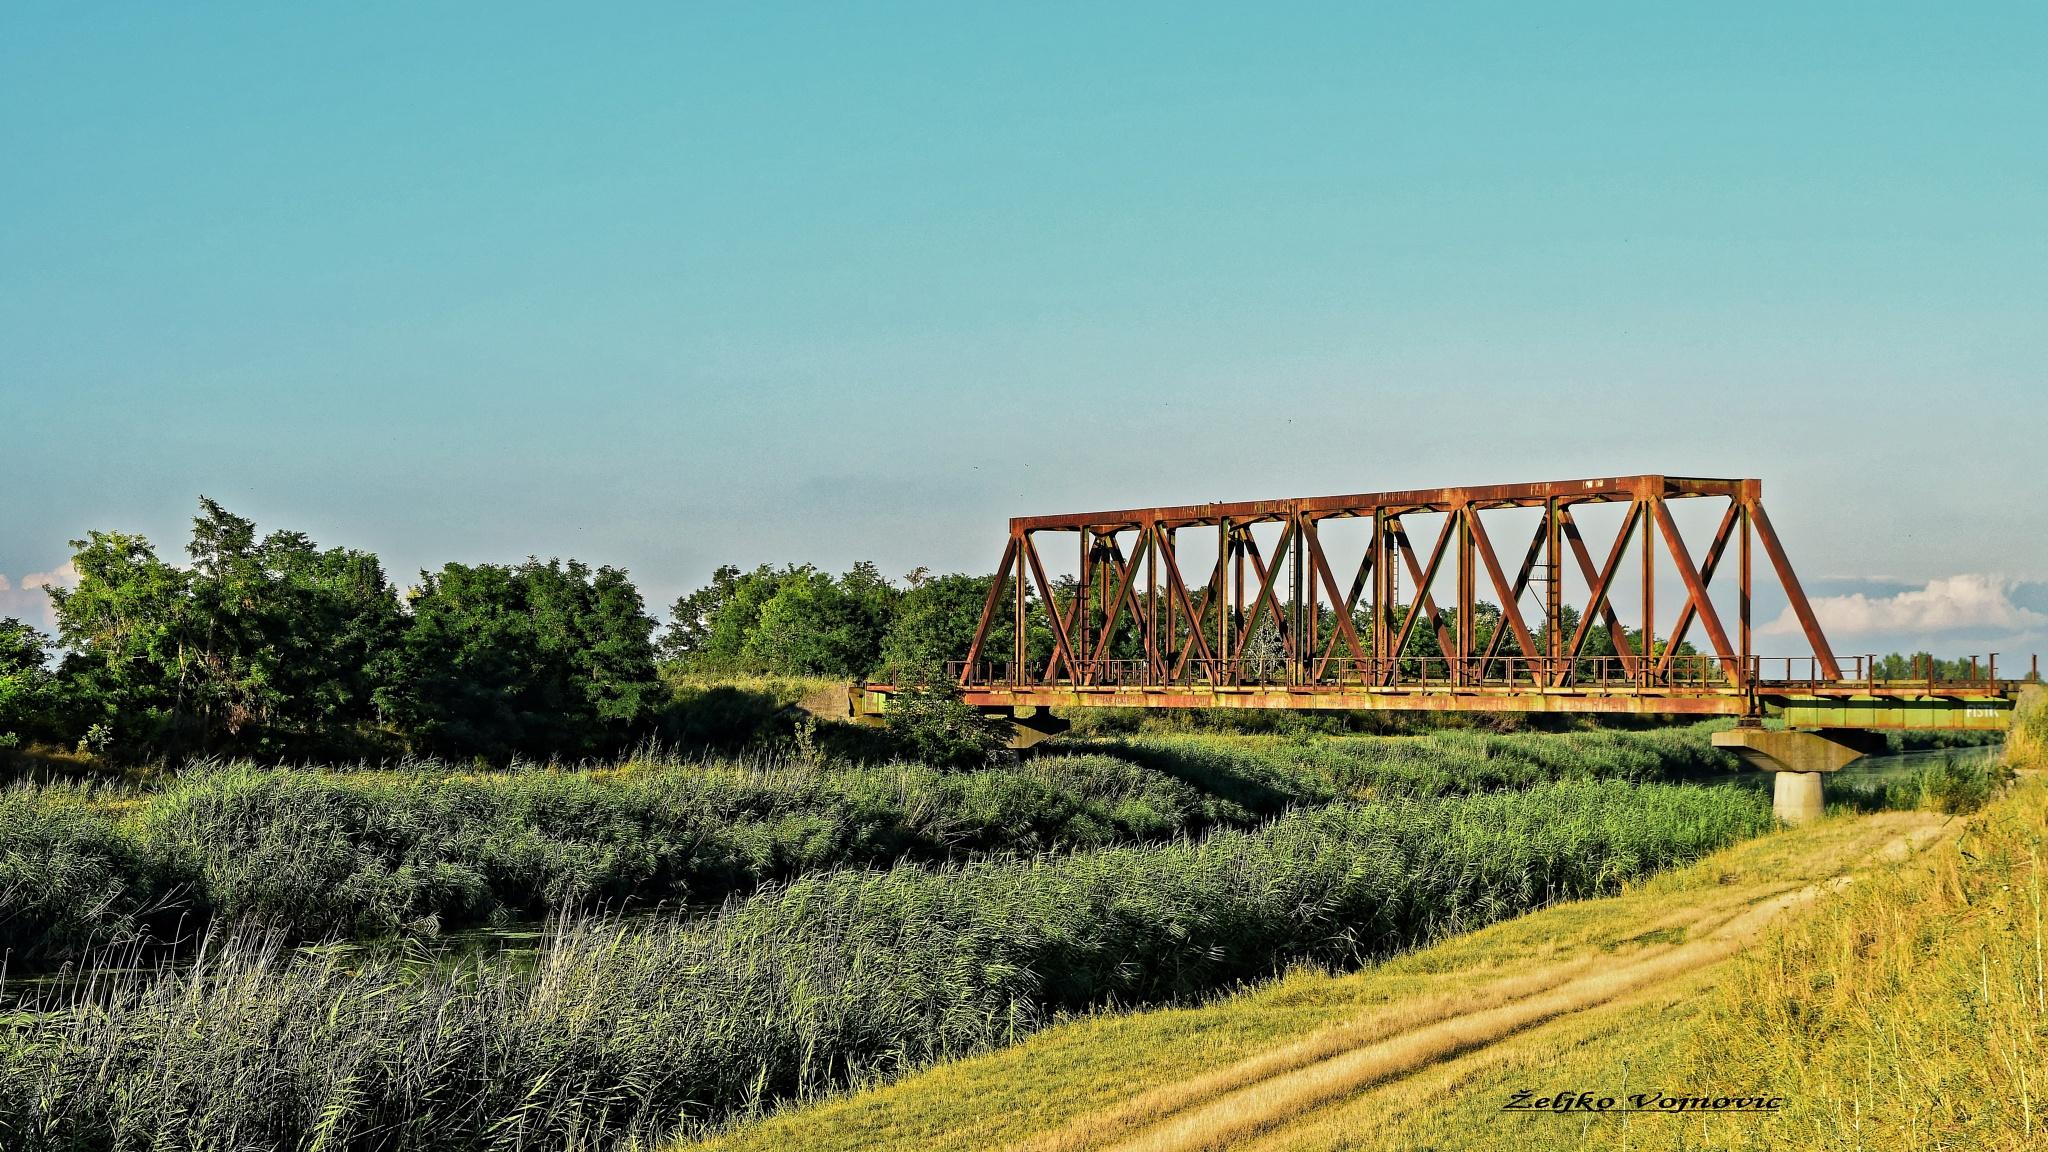 The old railway bridge ... by Željko Vojnović